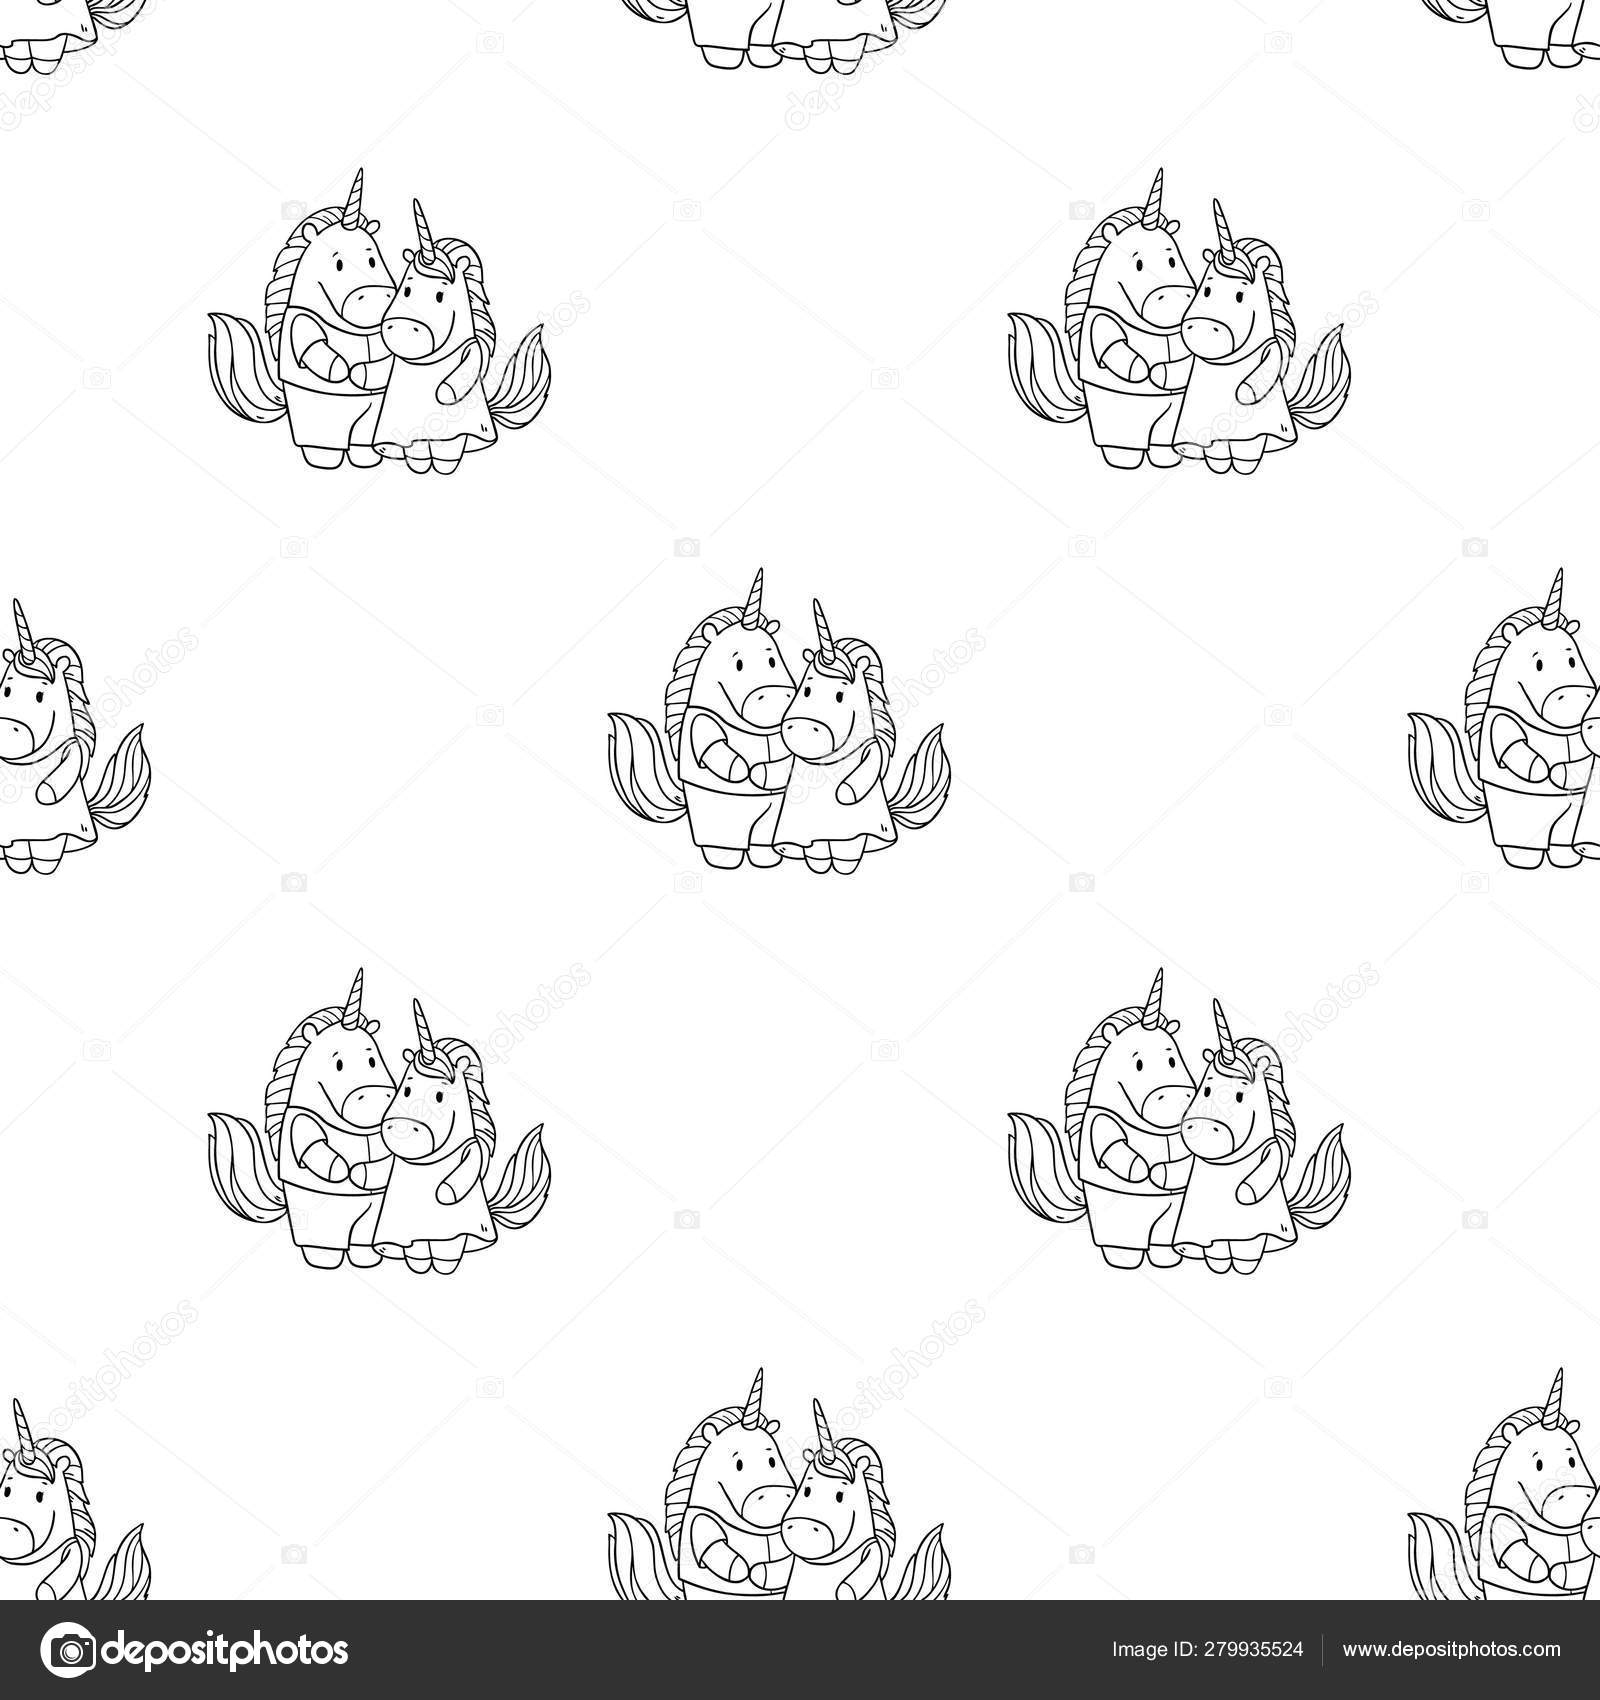 Unicorn Couple Seamless Pattern Copy Space Stock Vector C Lunter 279935524